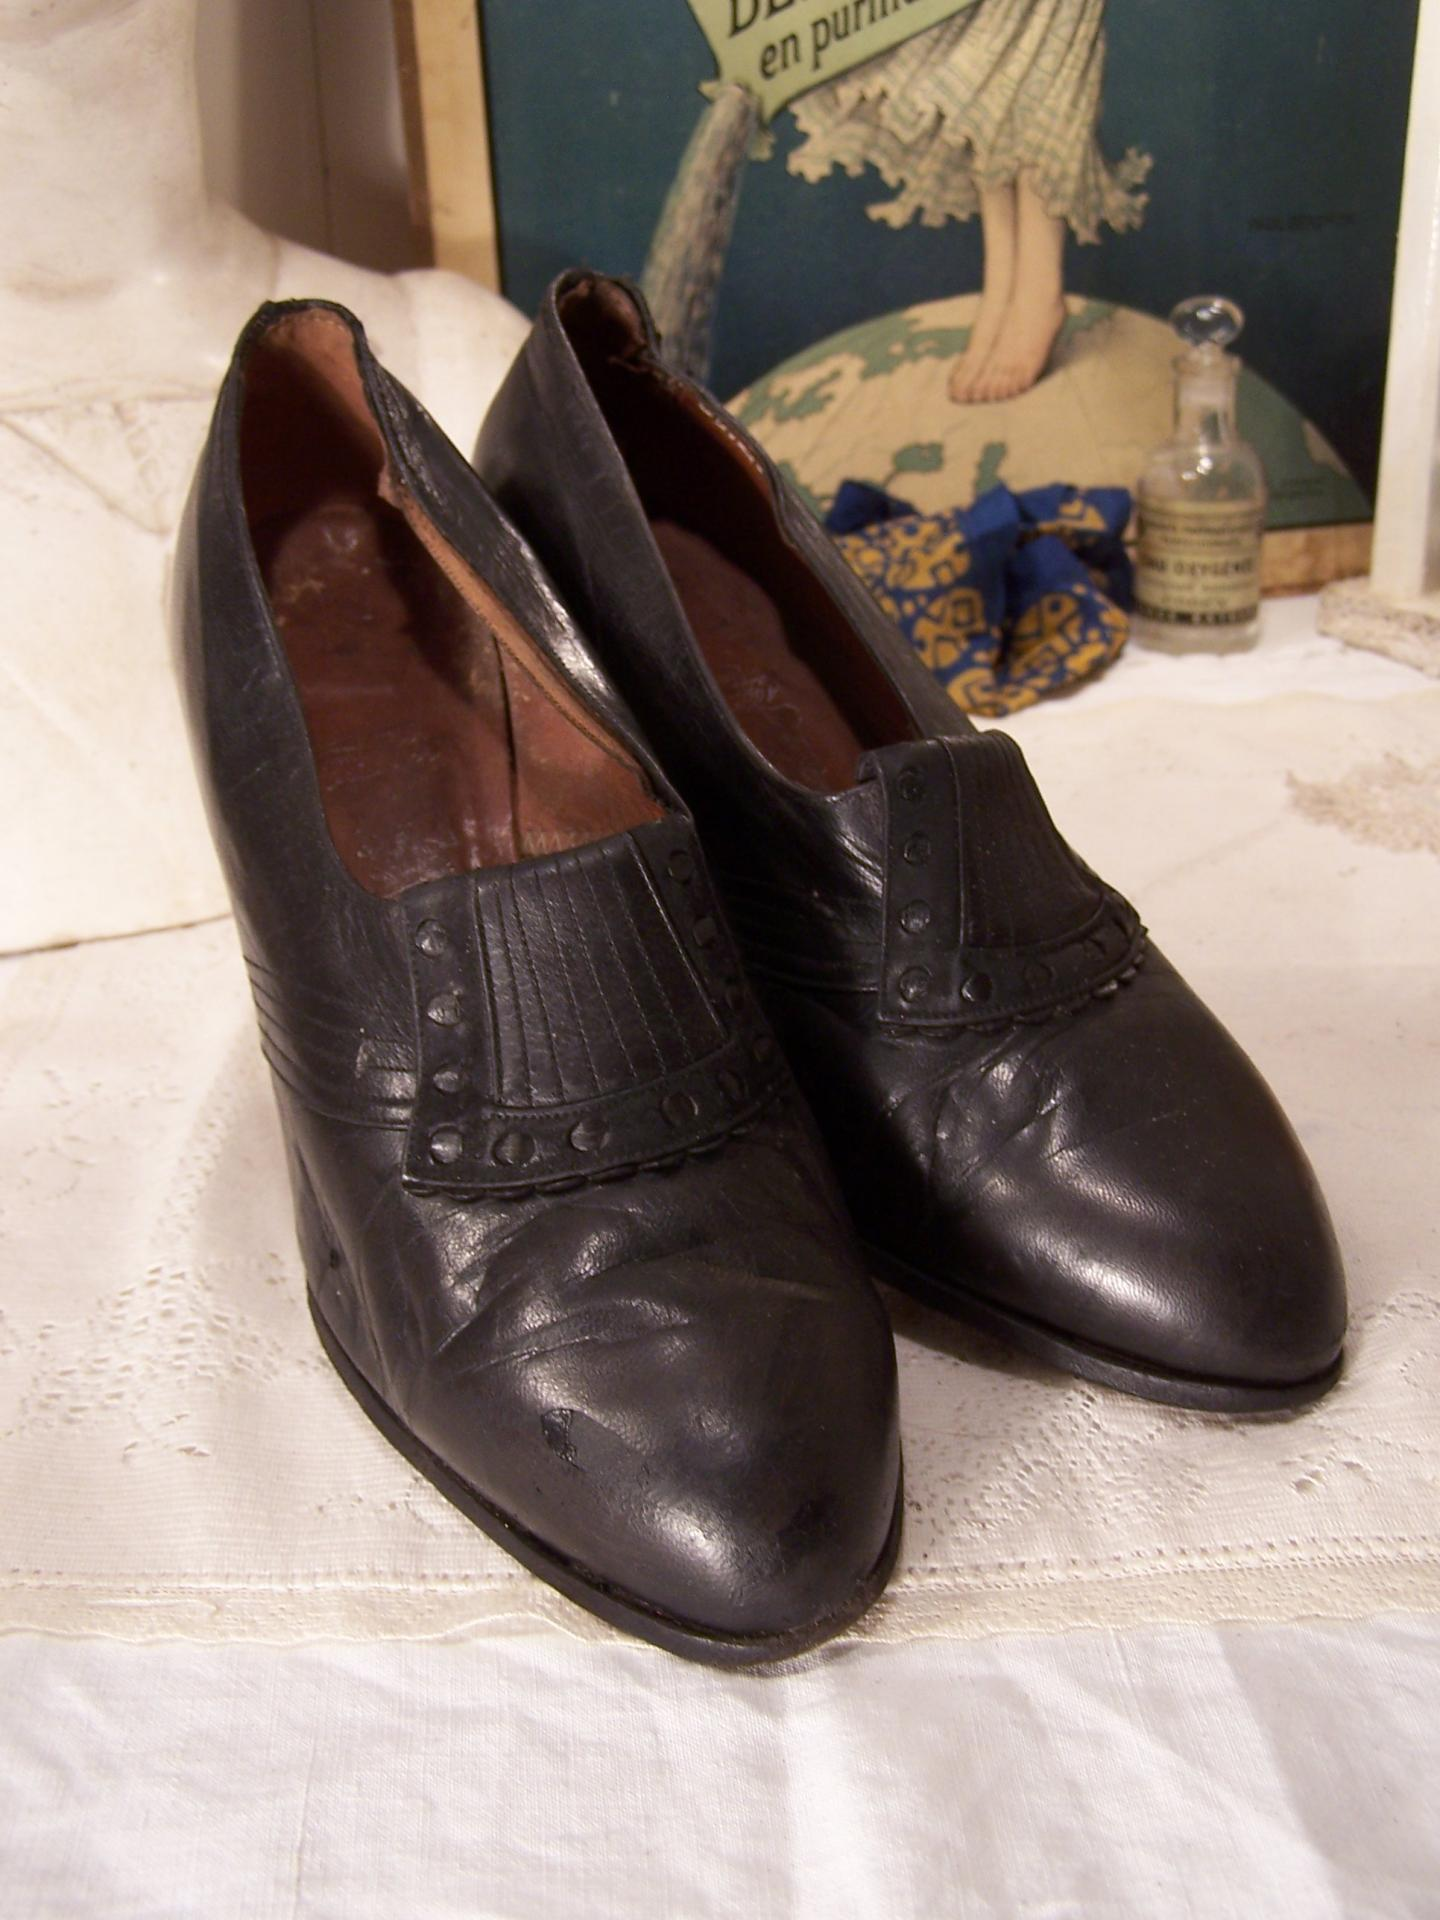 Chaussures en cuir chaussure de femme des ann es 40 chaussures vintage - Chaussures annees 50 femme ...